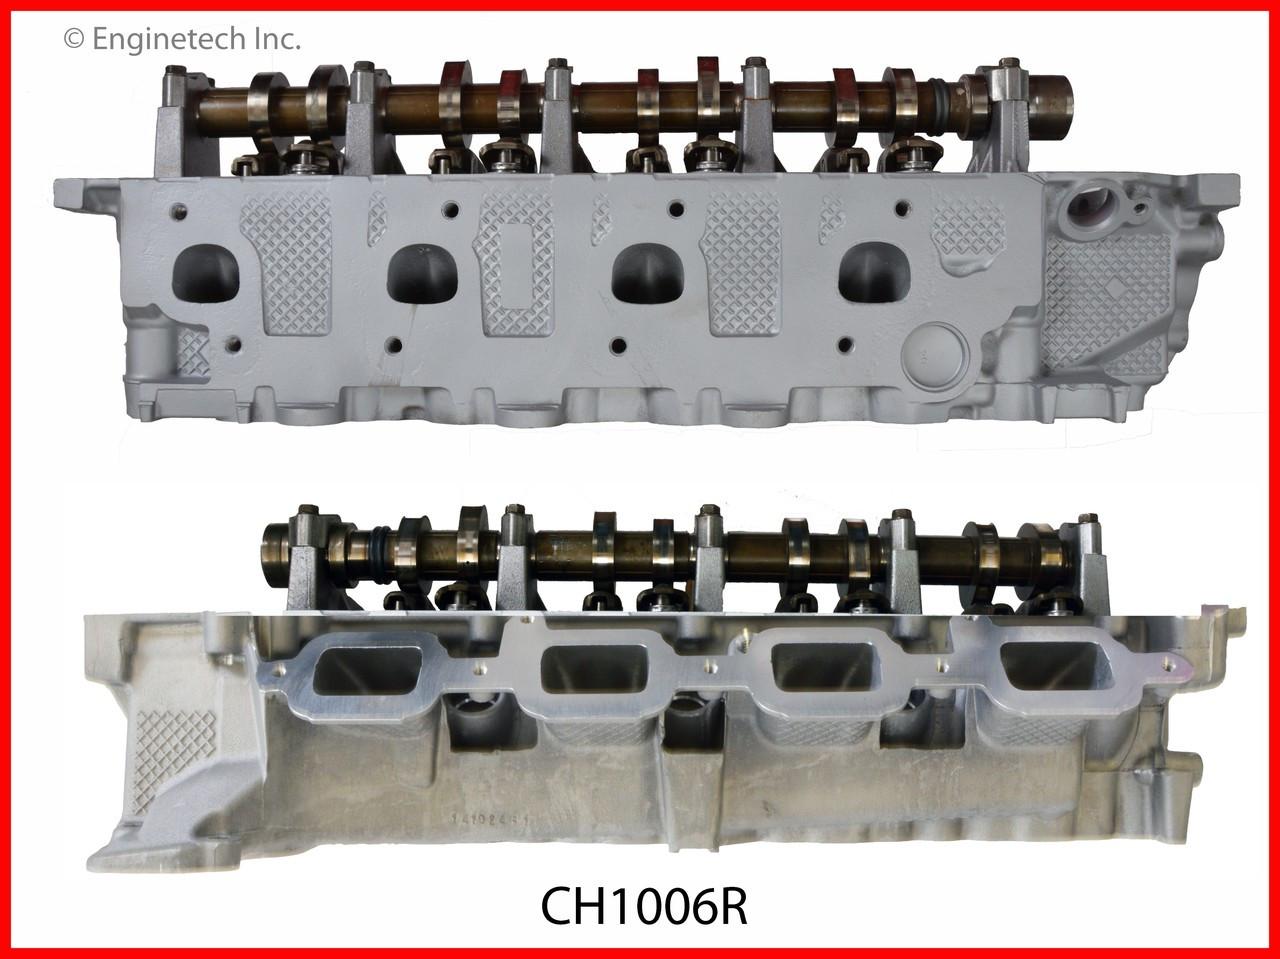 Cylinder Head Assembly - 2007 Mitsubishi Raider 4.7L (CH1006R.E44)